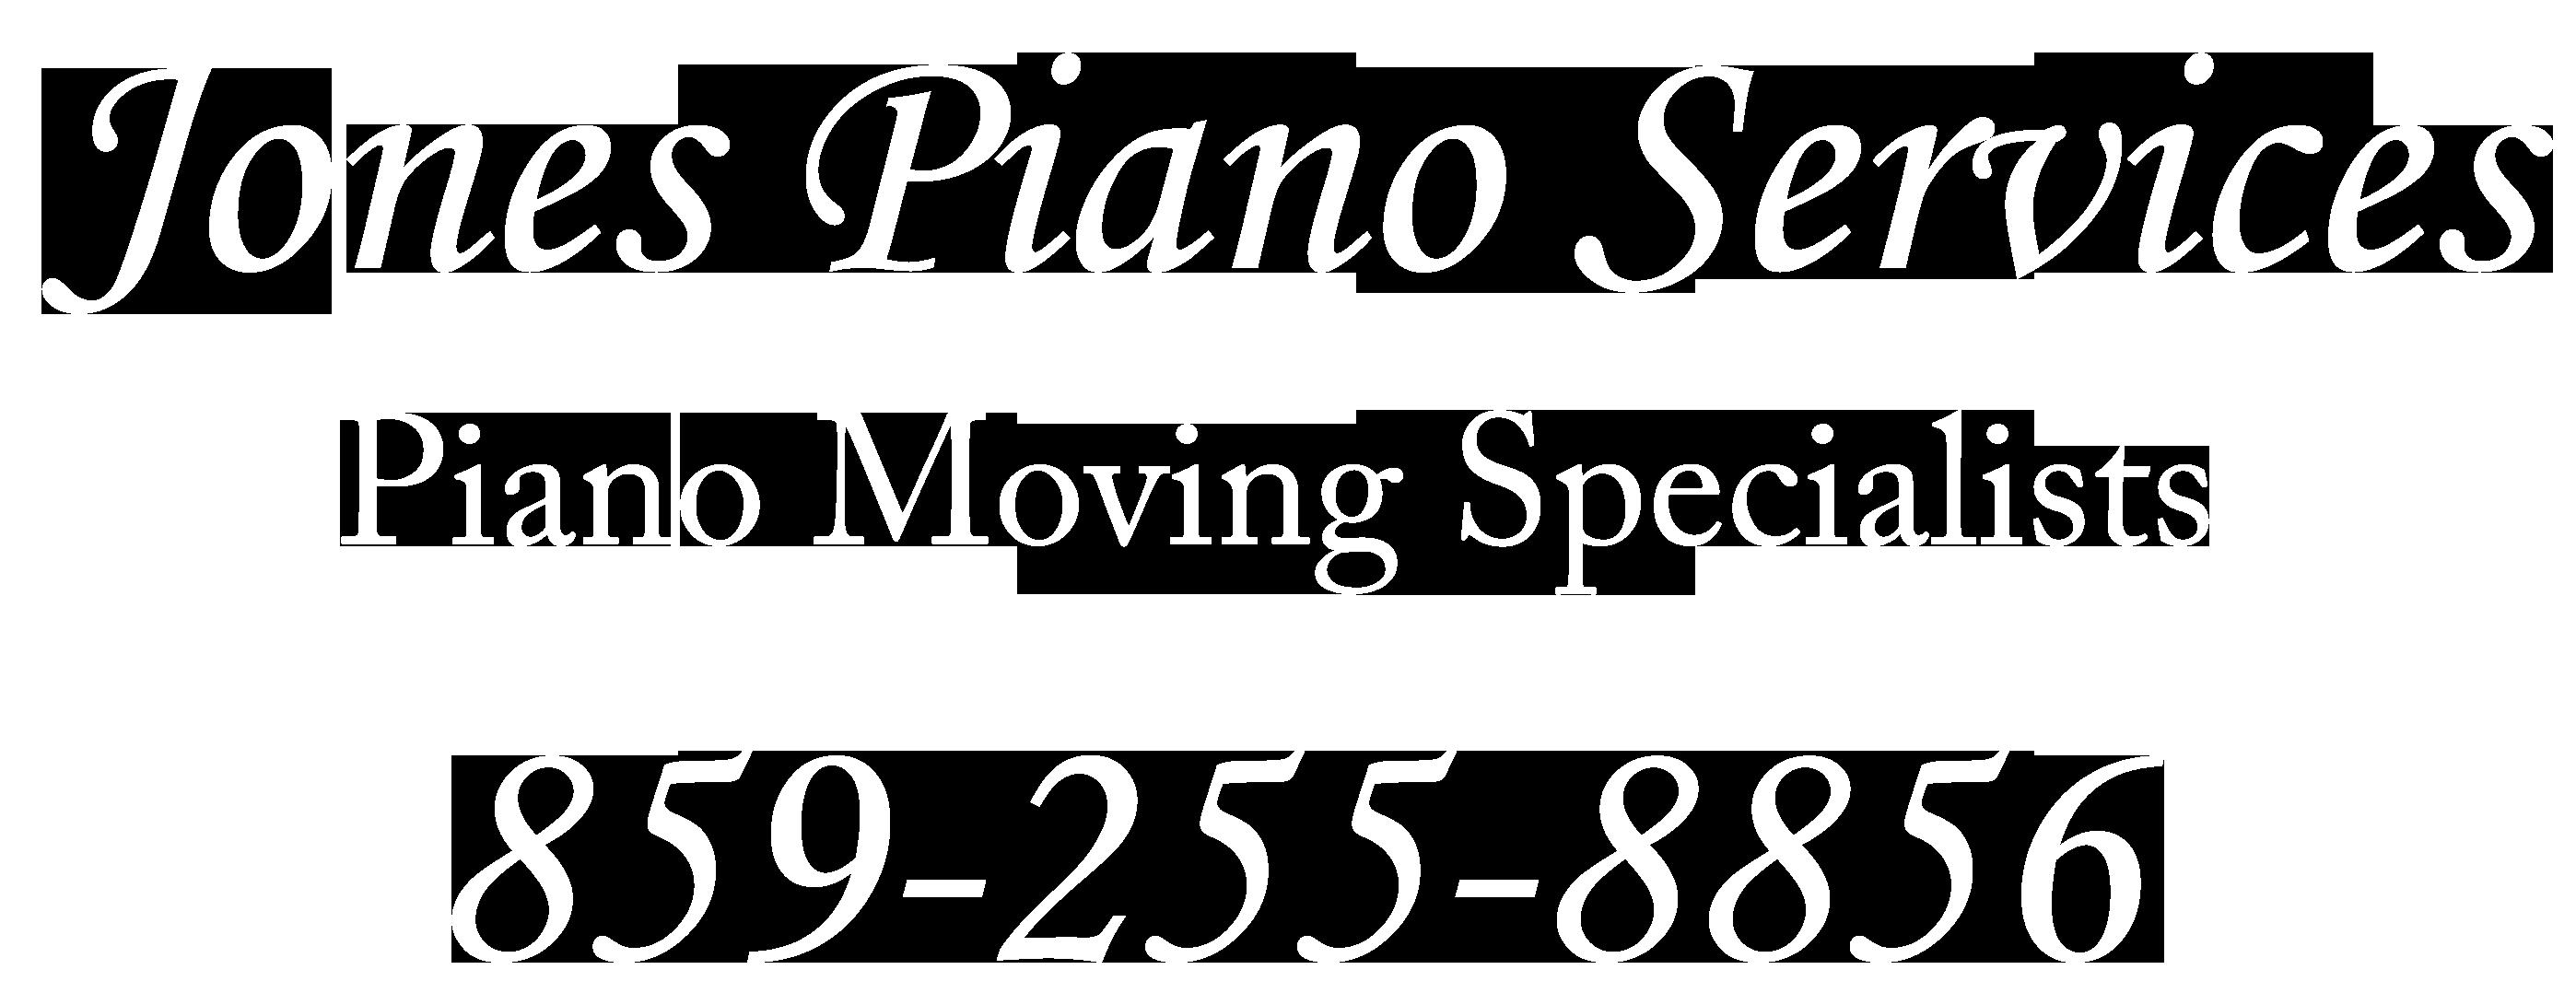 Jones Piano Services | Lexington, KY